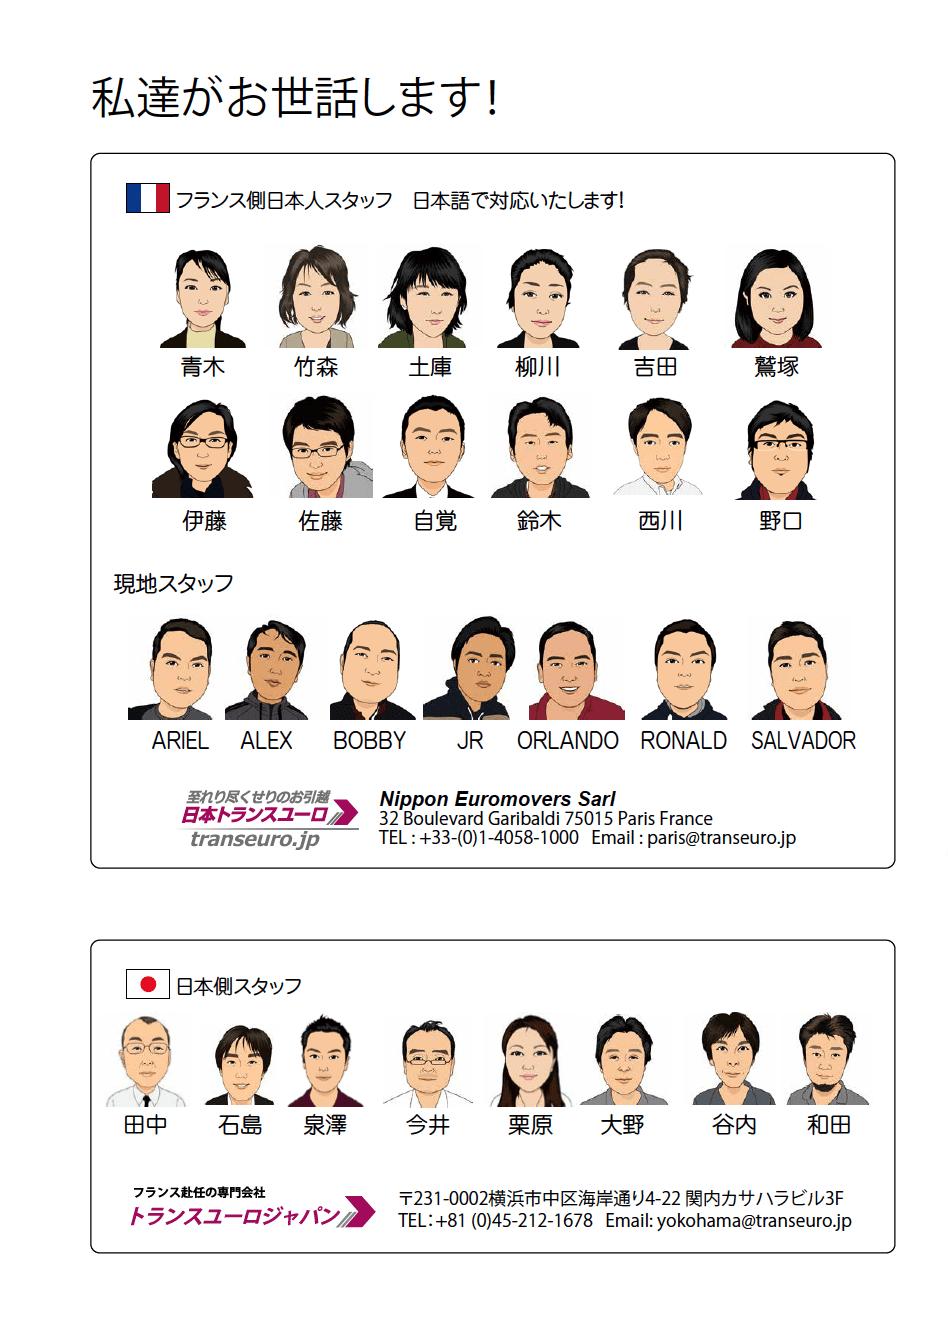 brochure_Transeuro_from_japan_12